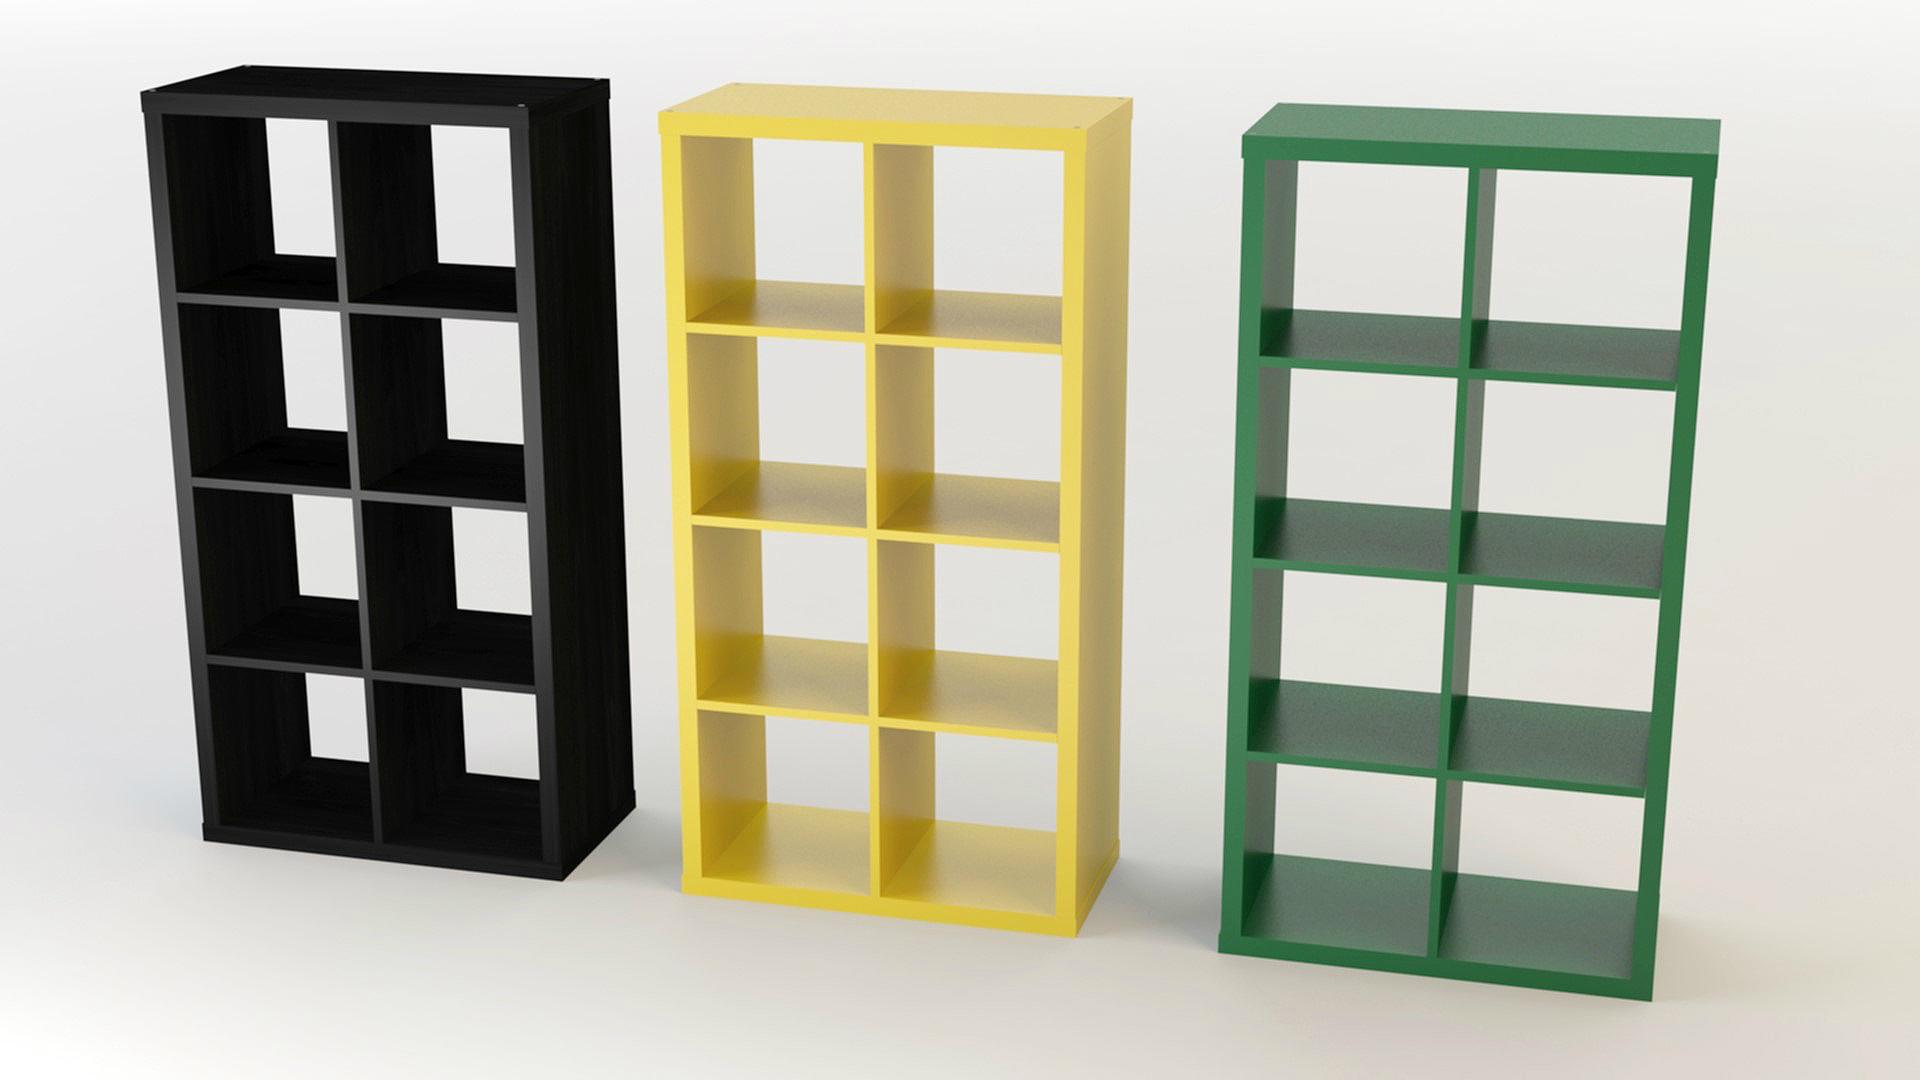 Ikea Kallax Shelves by s_i_S_c_o | 3DOcean